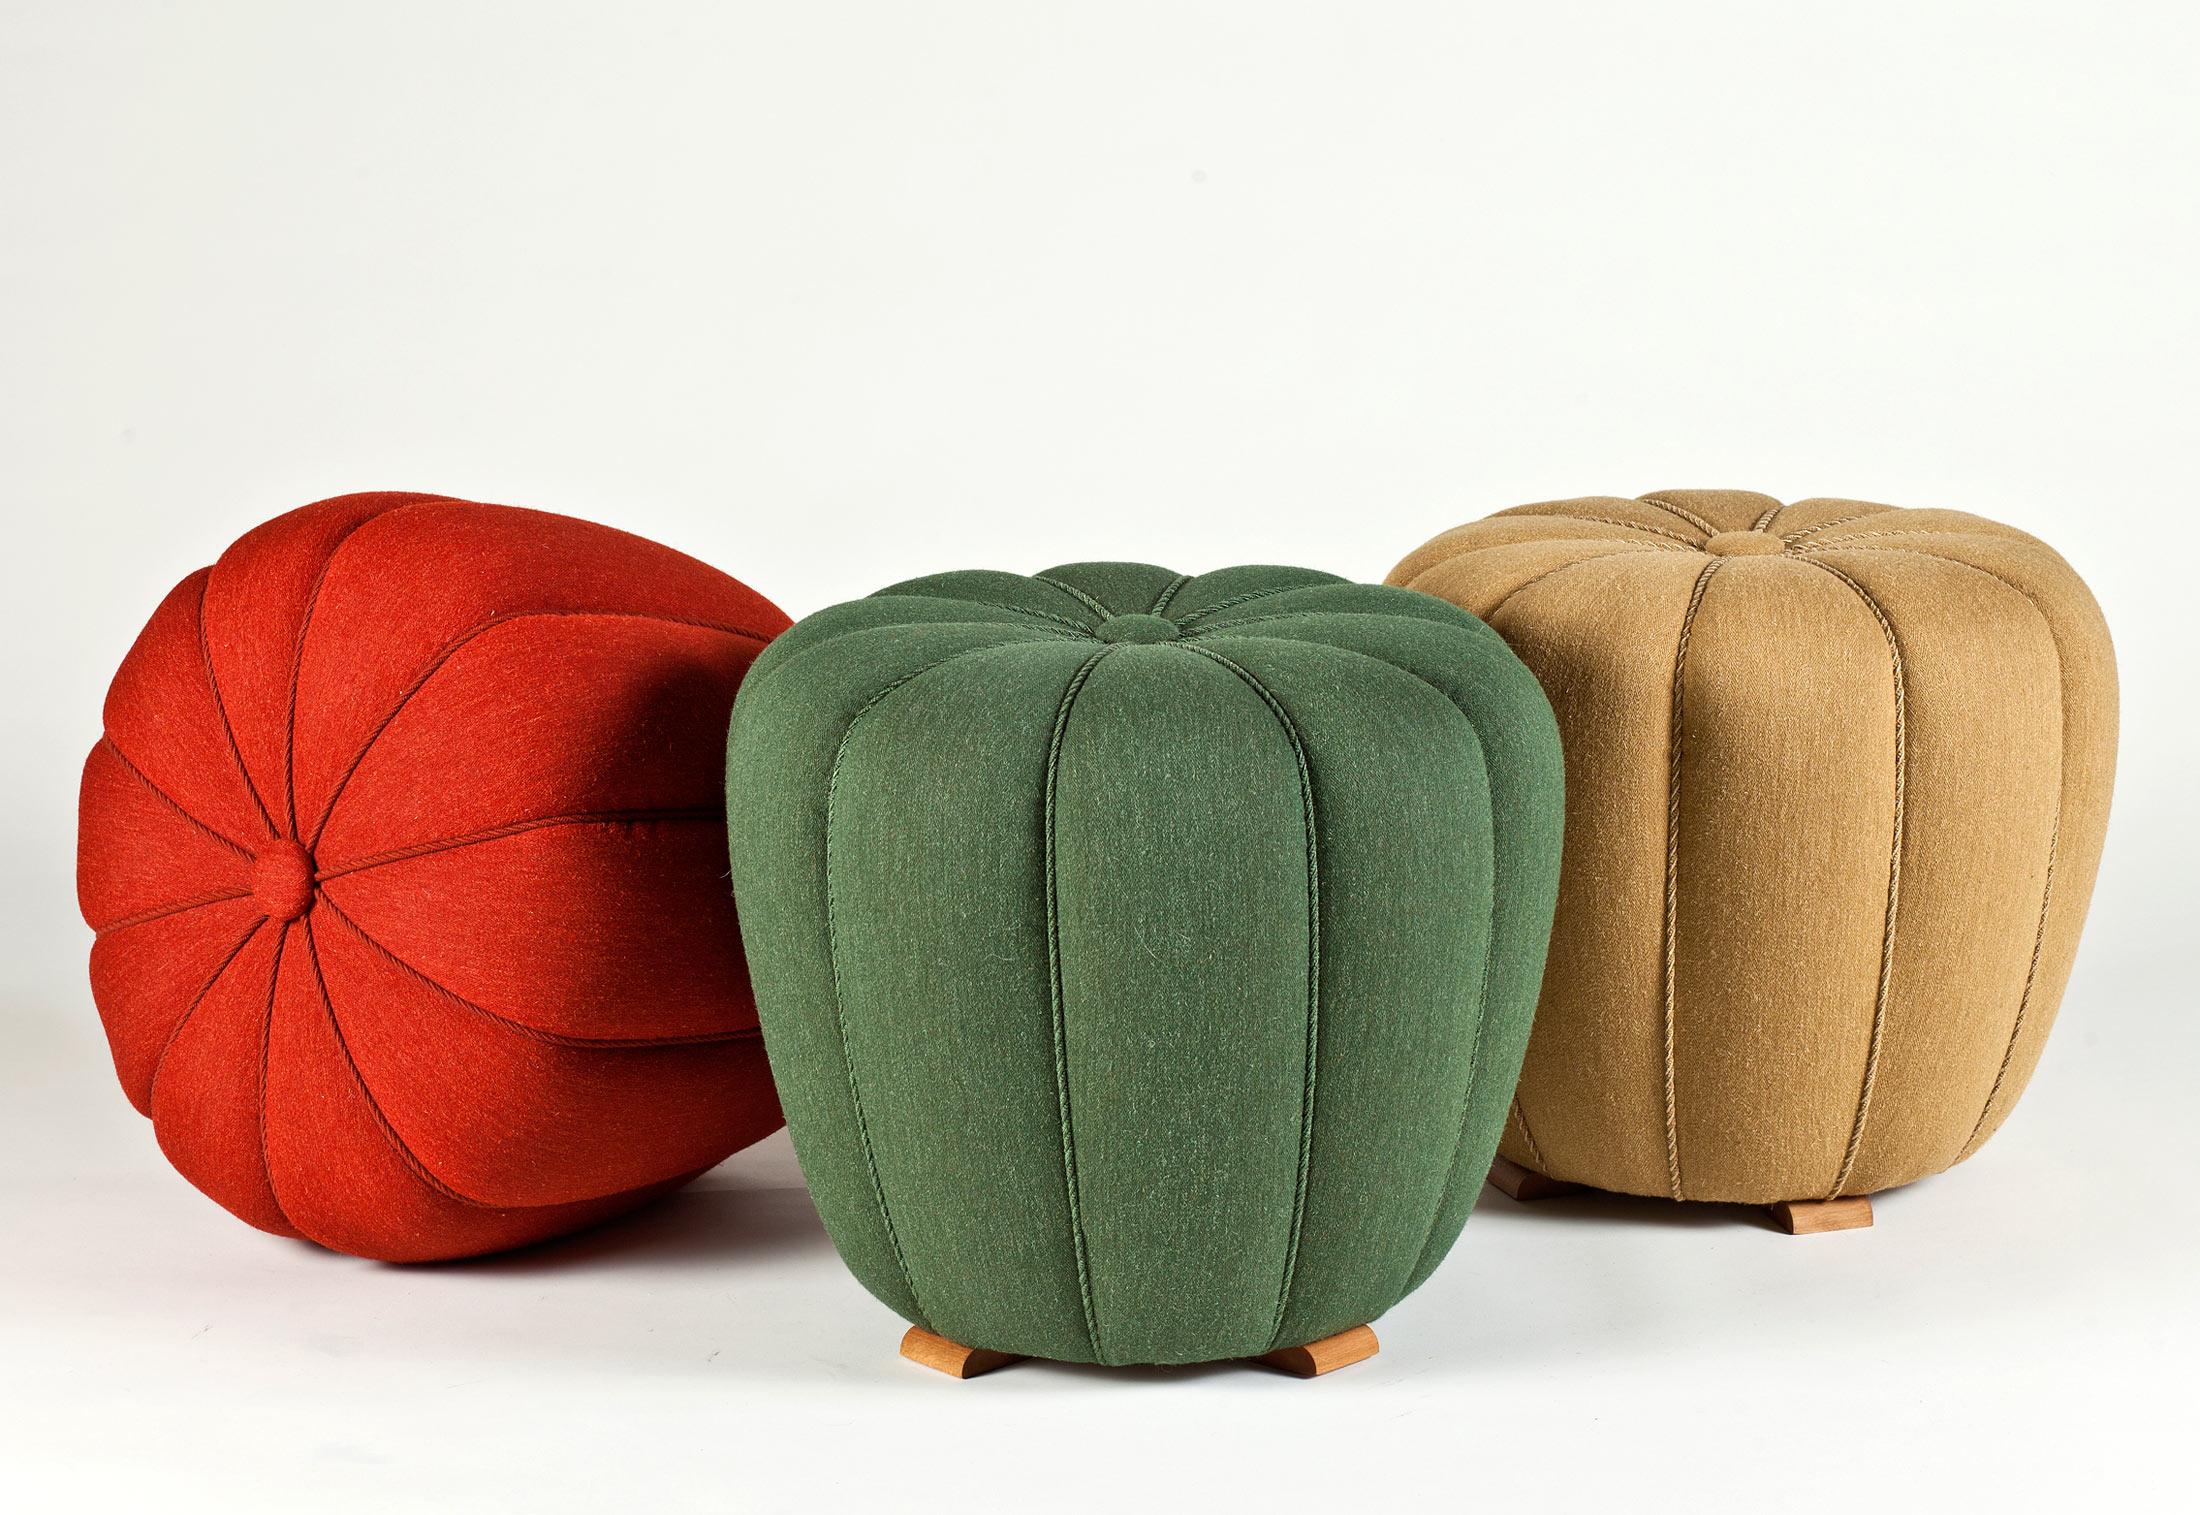 kaktus von wohnkultur 66 stylepark. Black Bedroom Furniture Sets. Home Design Ideas